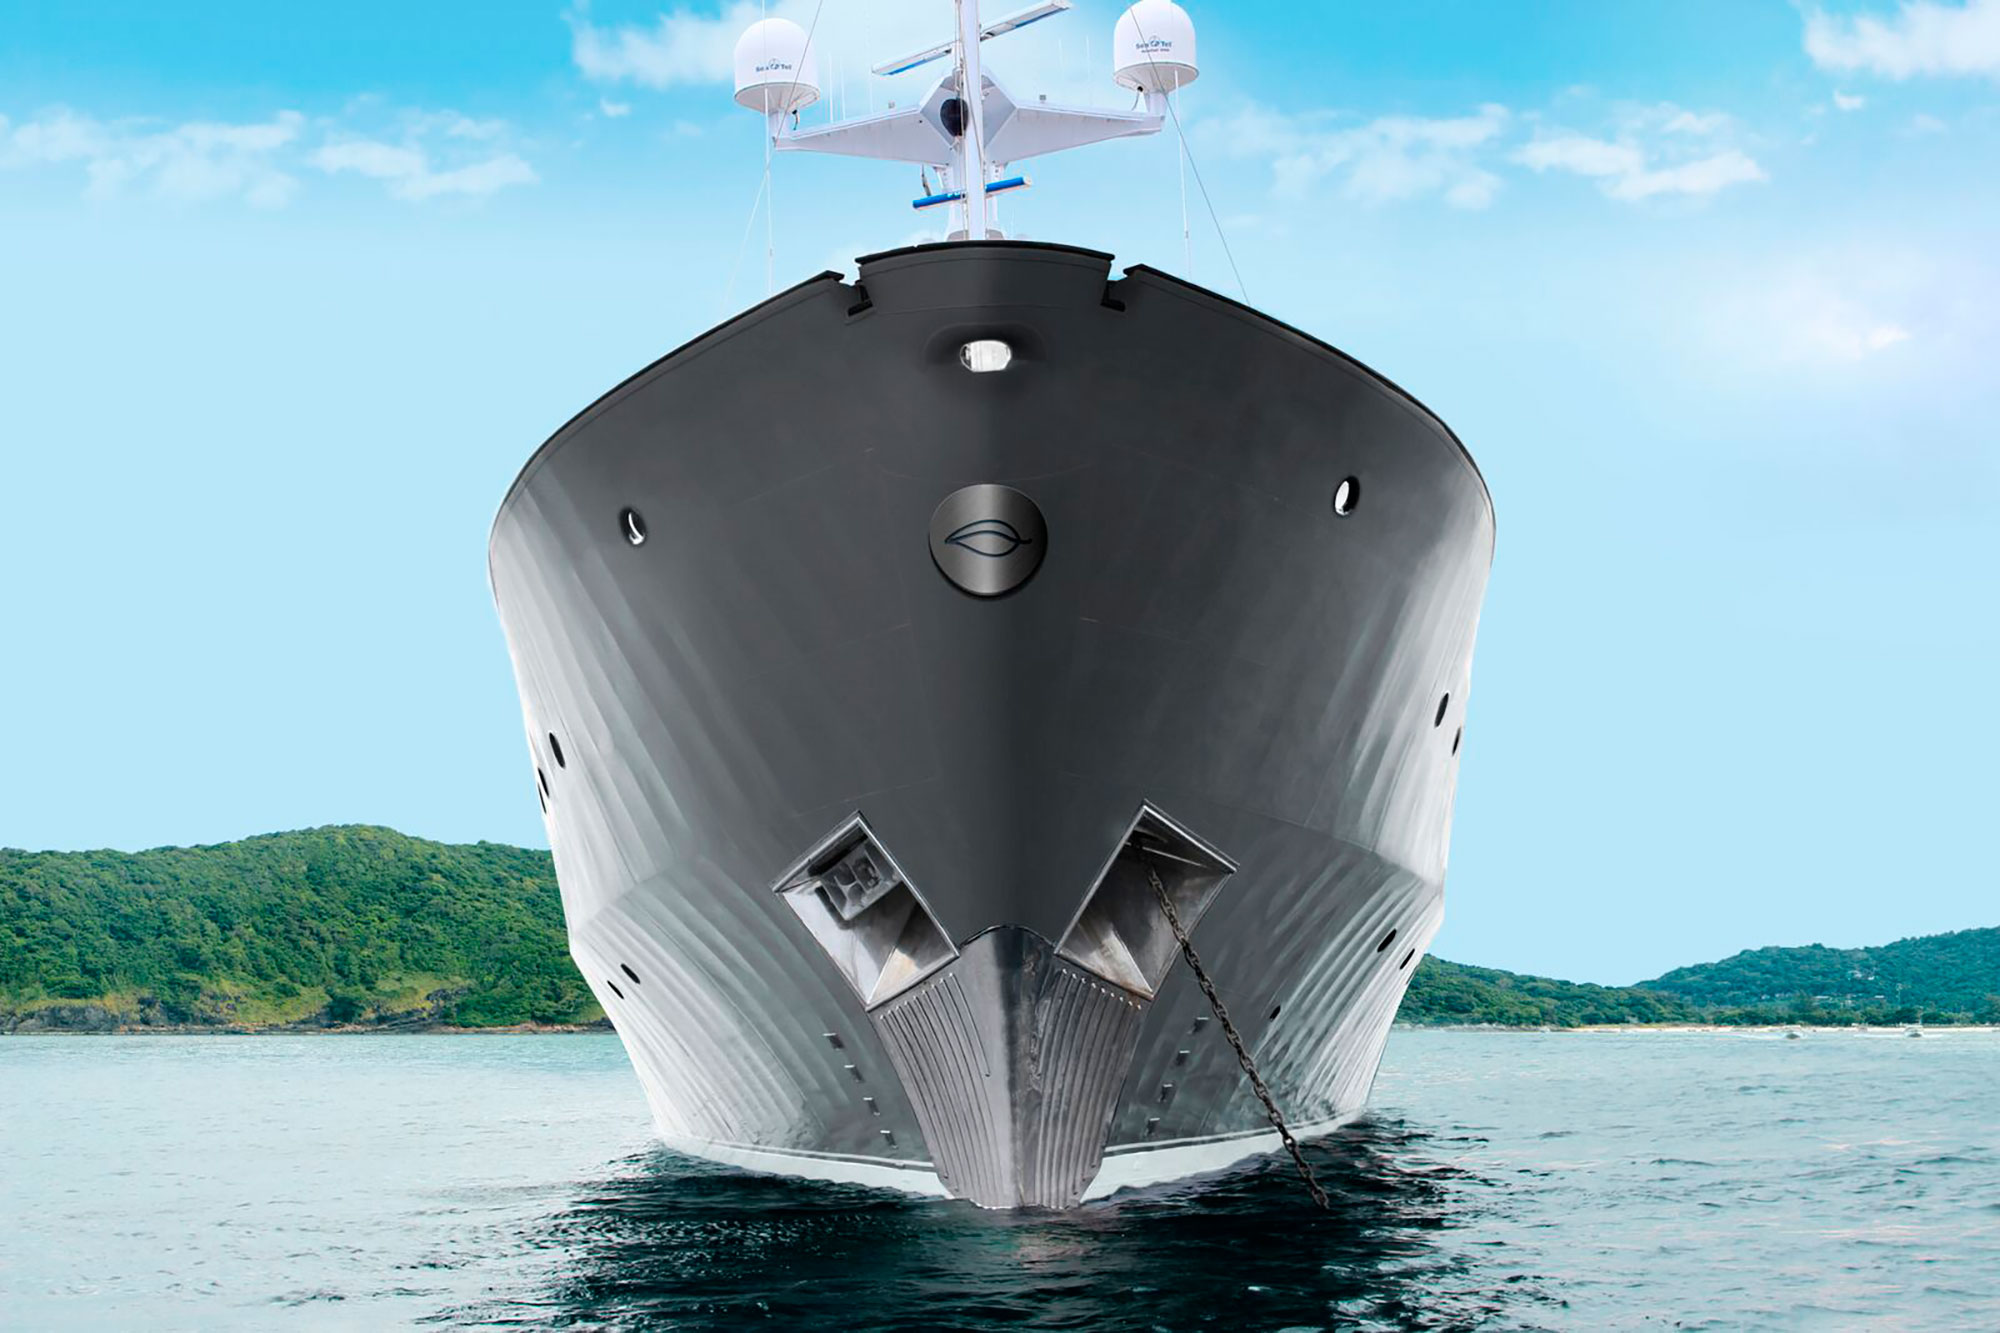 Crucero AQUA BLU de 12 noches - Spice Islands to Raja Ampat - Indonesia- imagen #2